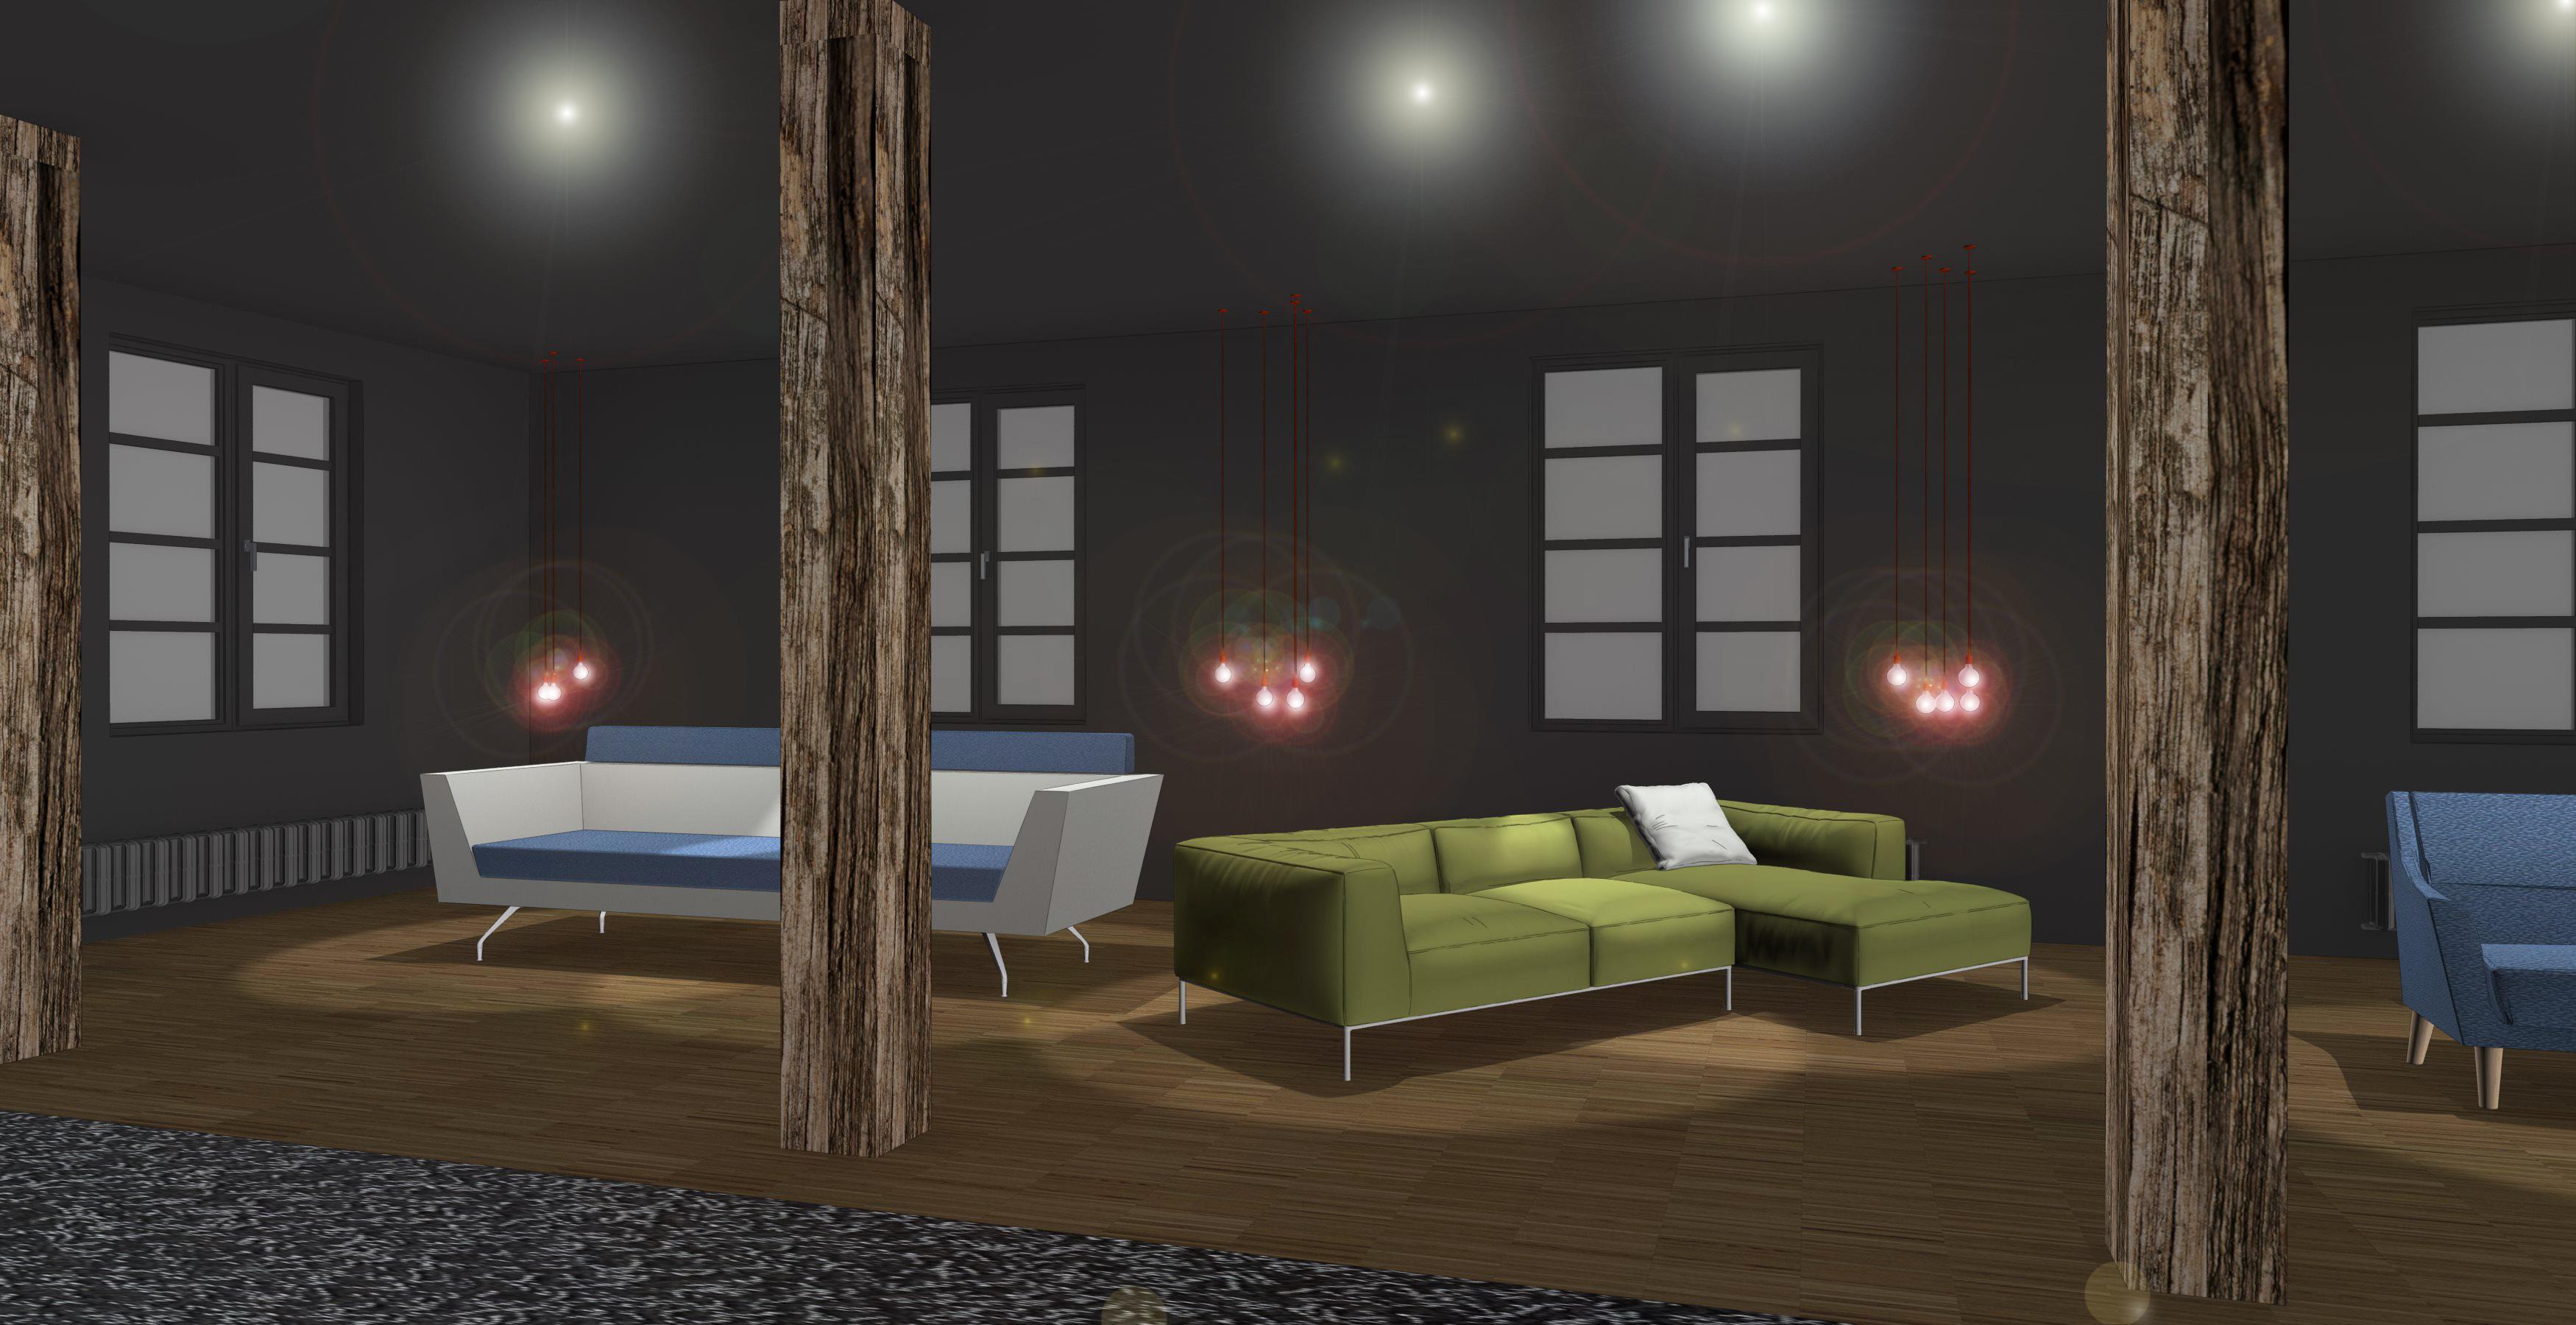 Innenarchitektur Rendering Showroom Dark Dunkel Entwurf